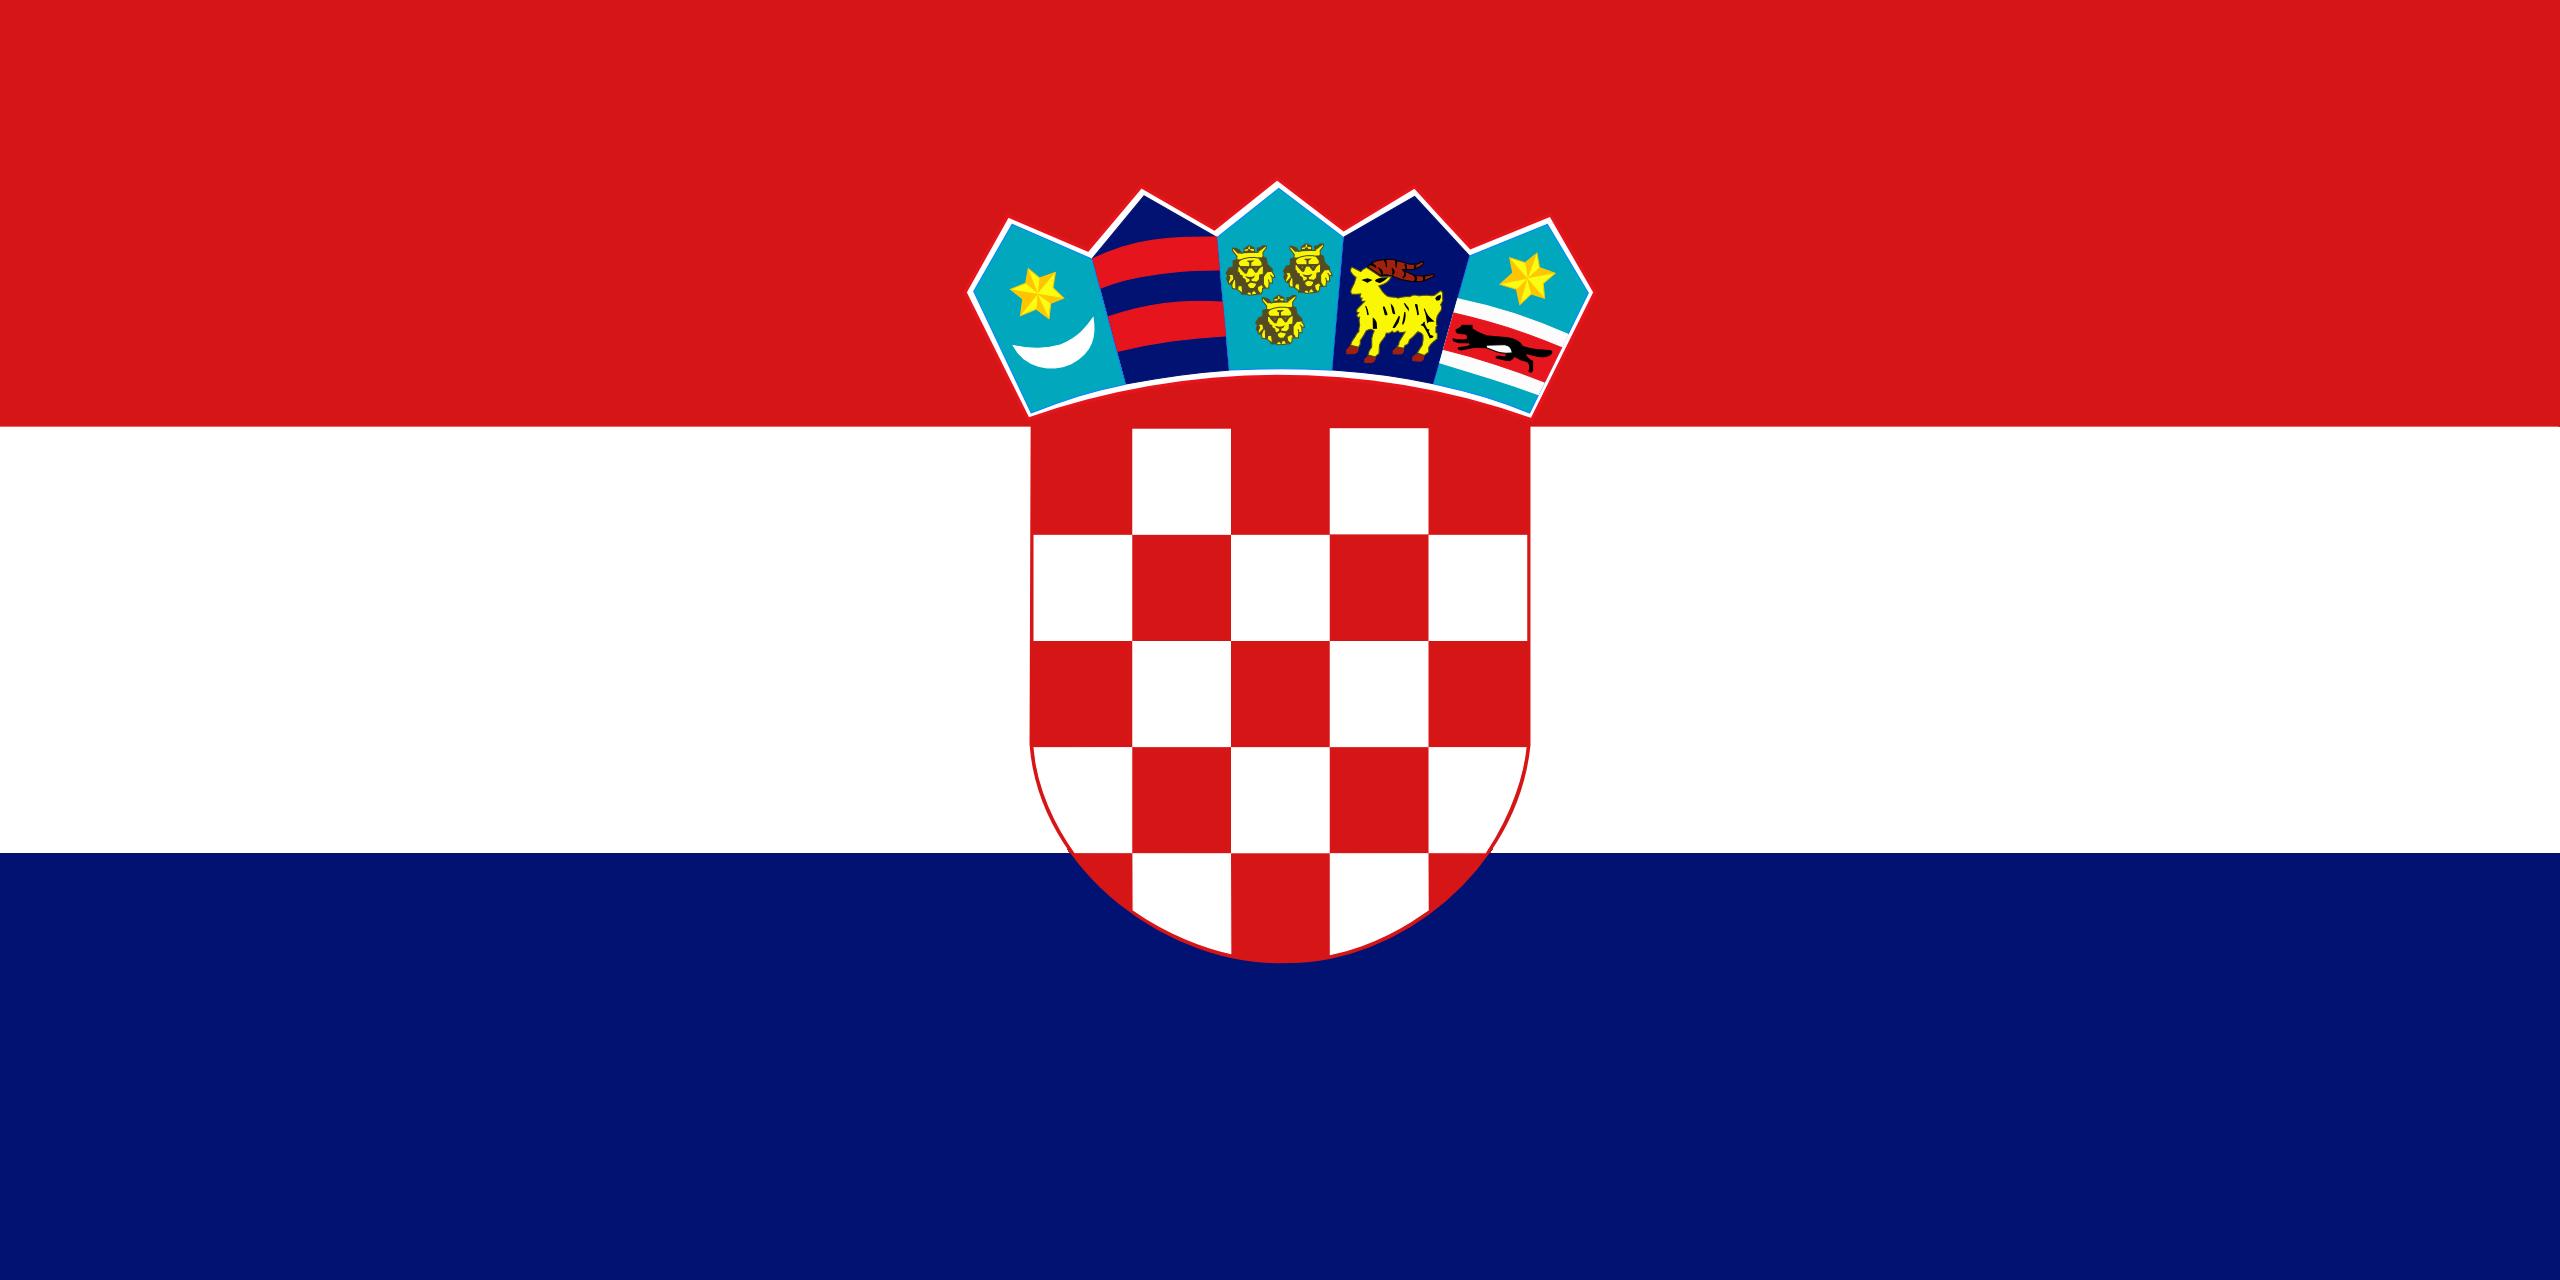 hr-1 Análisis de Croacia - Grupo D - Comunio-Biwenger